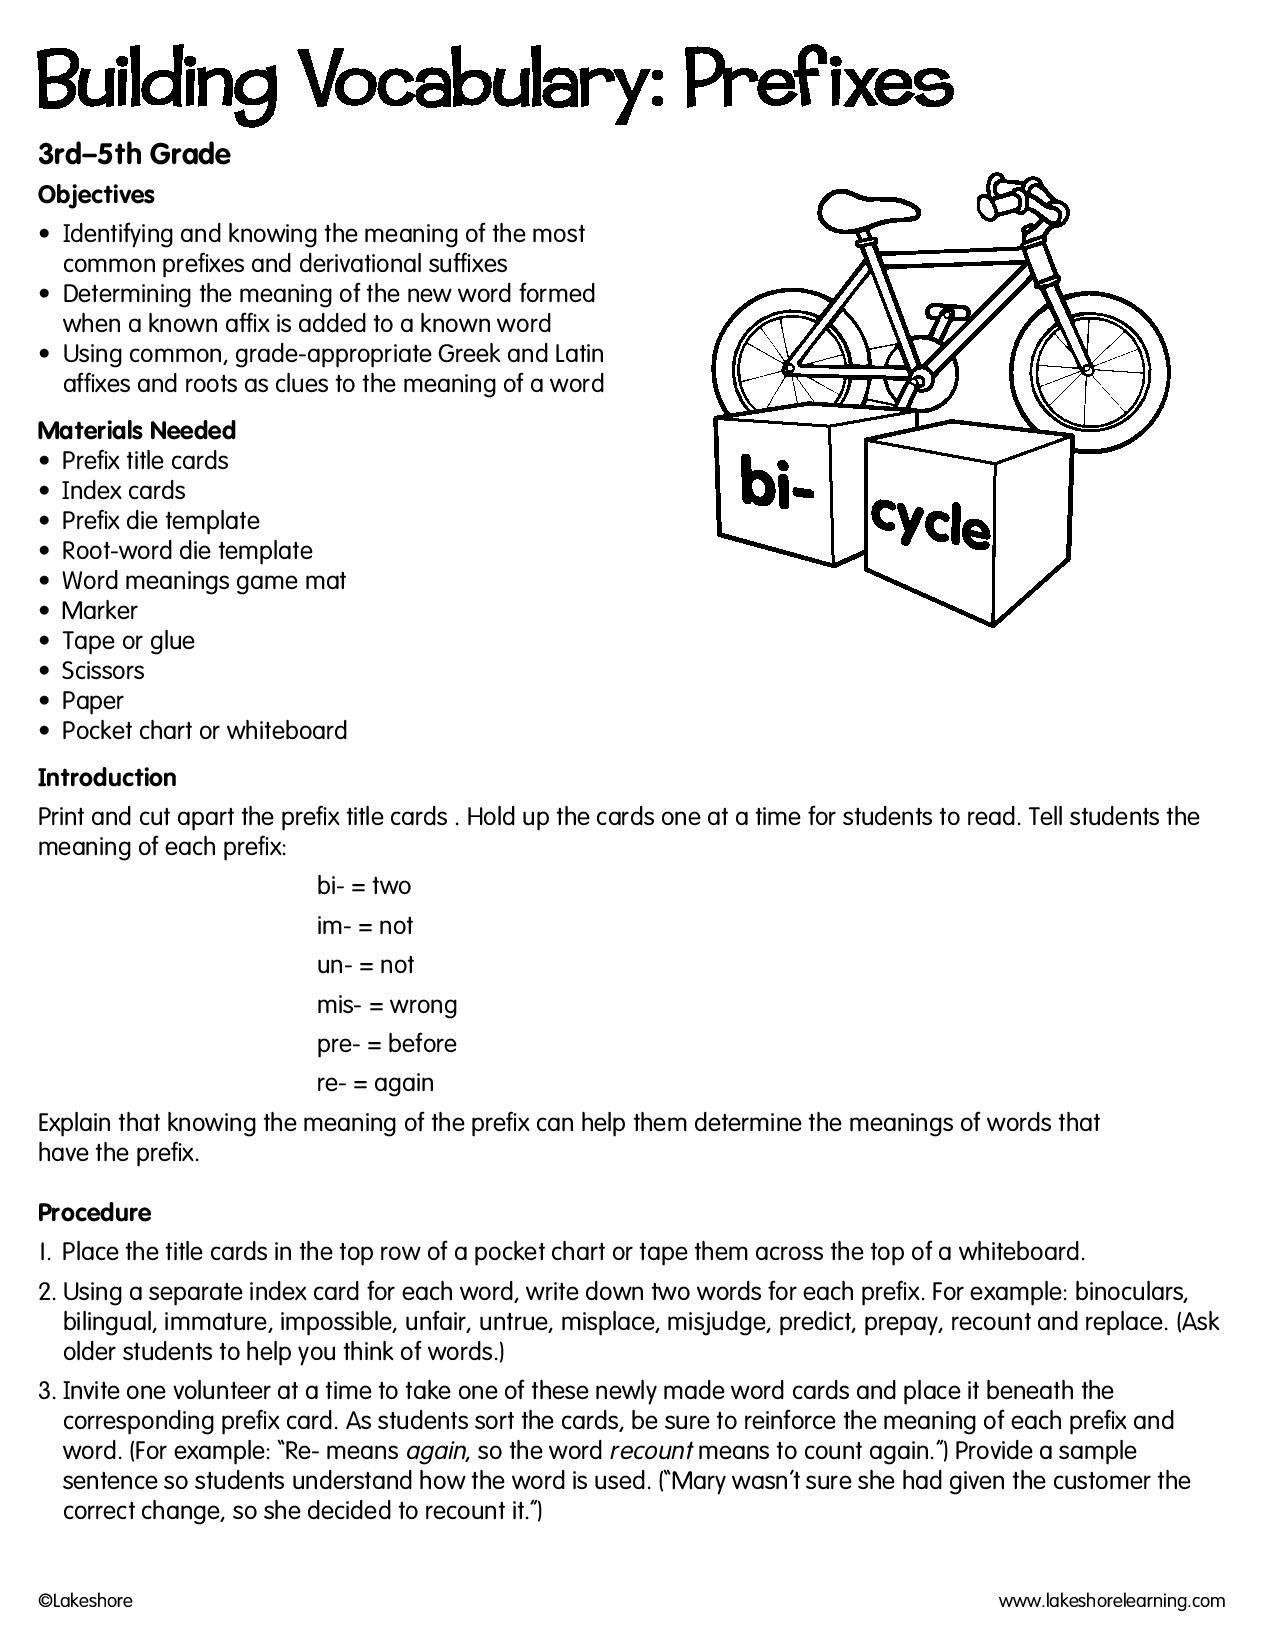 Building Vocabulary Prefixes Lessonplan Vocabulary